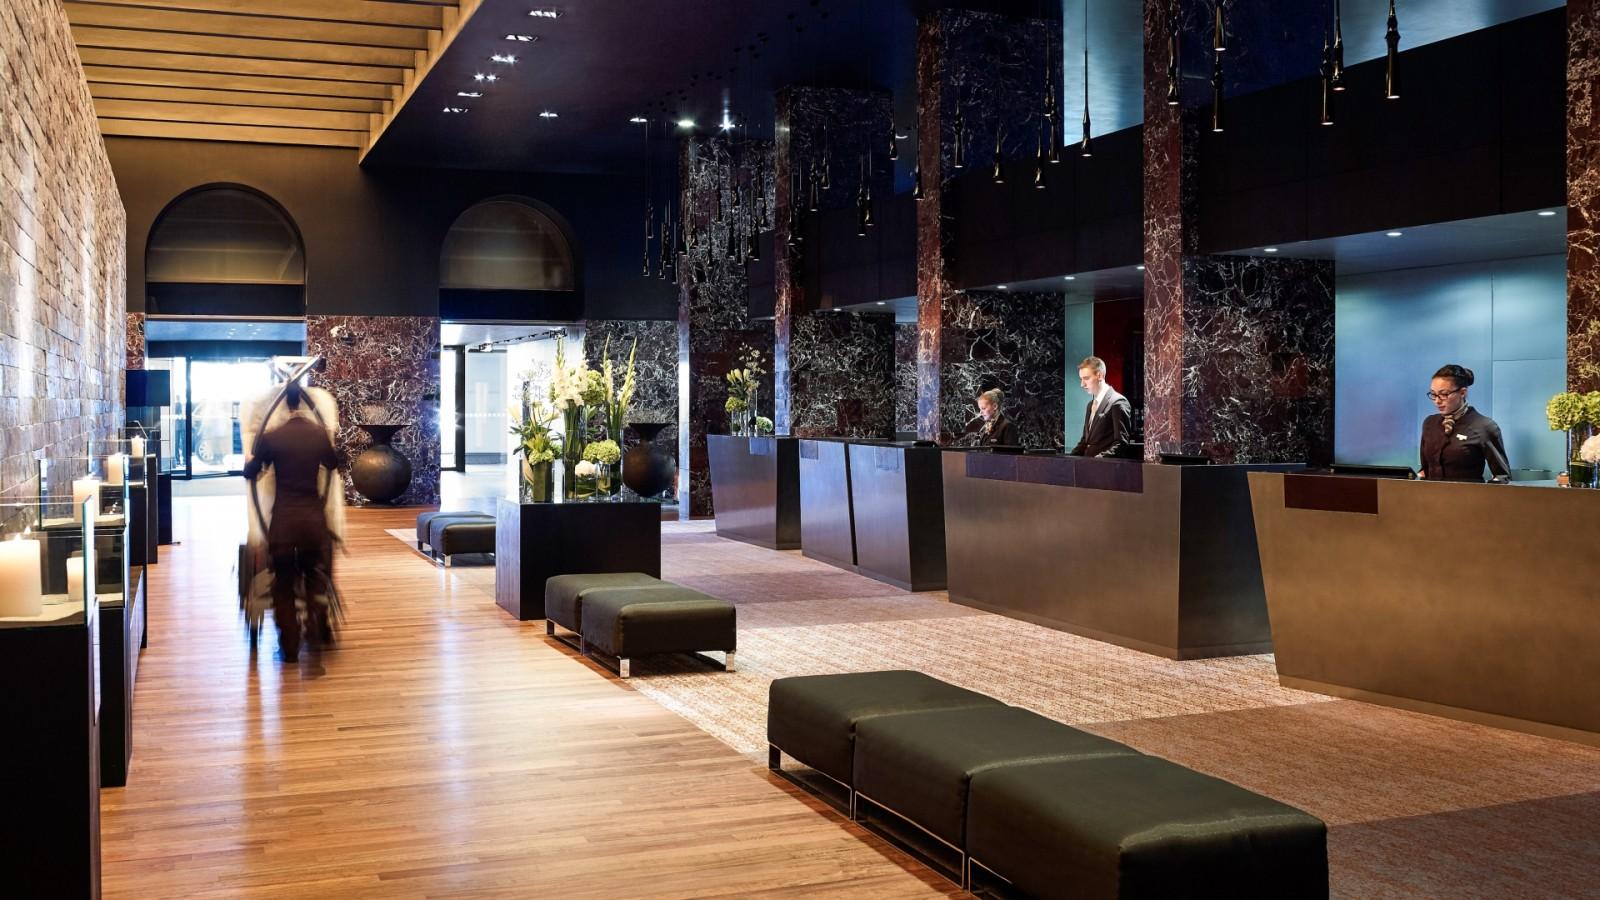 sofitel munich bayerpost lobby. Black Bedroom Furniture Sets. Home Design Ideas